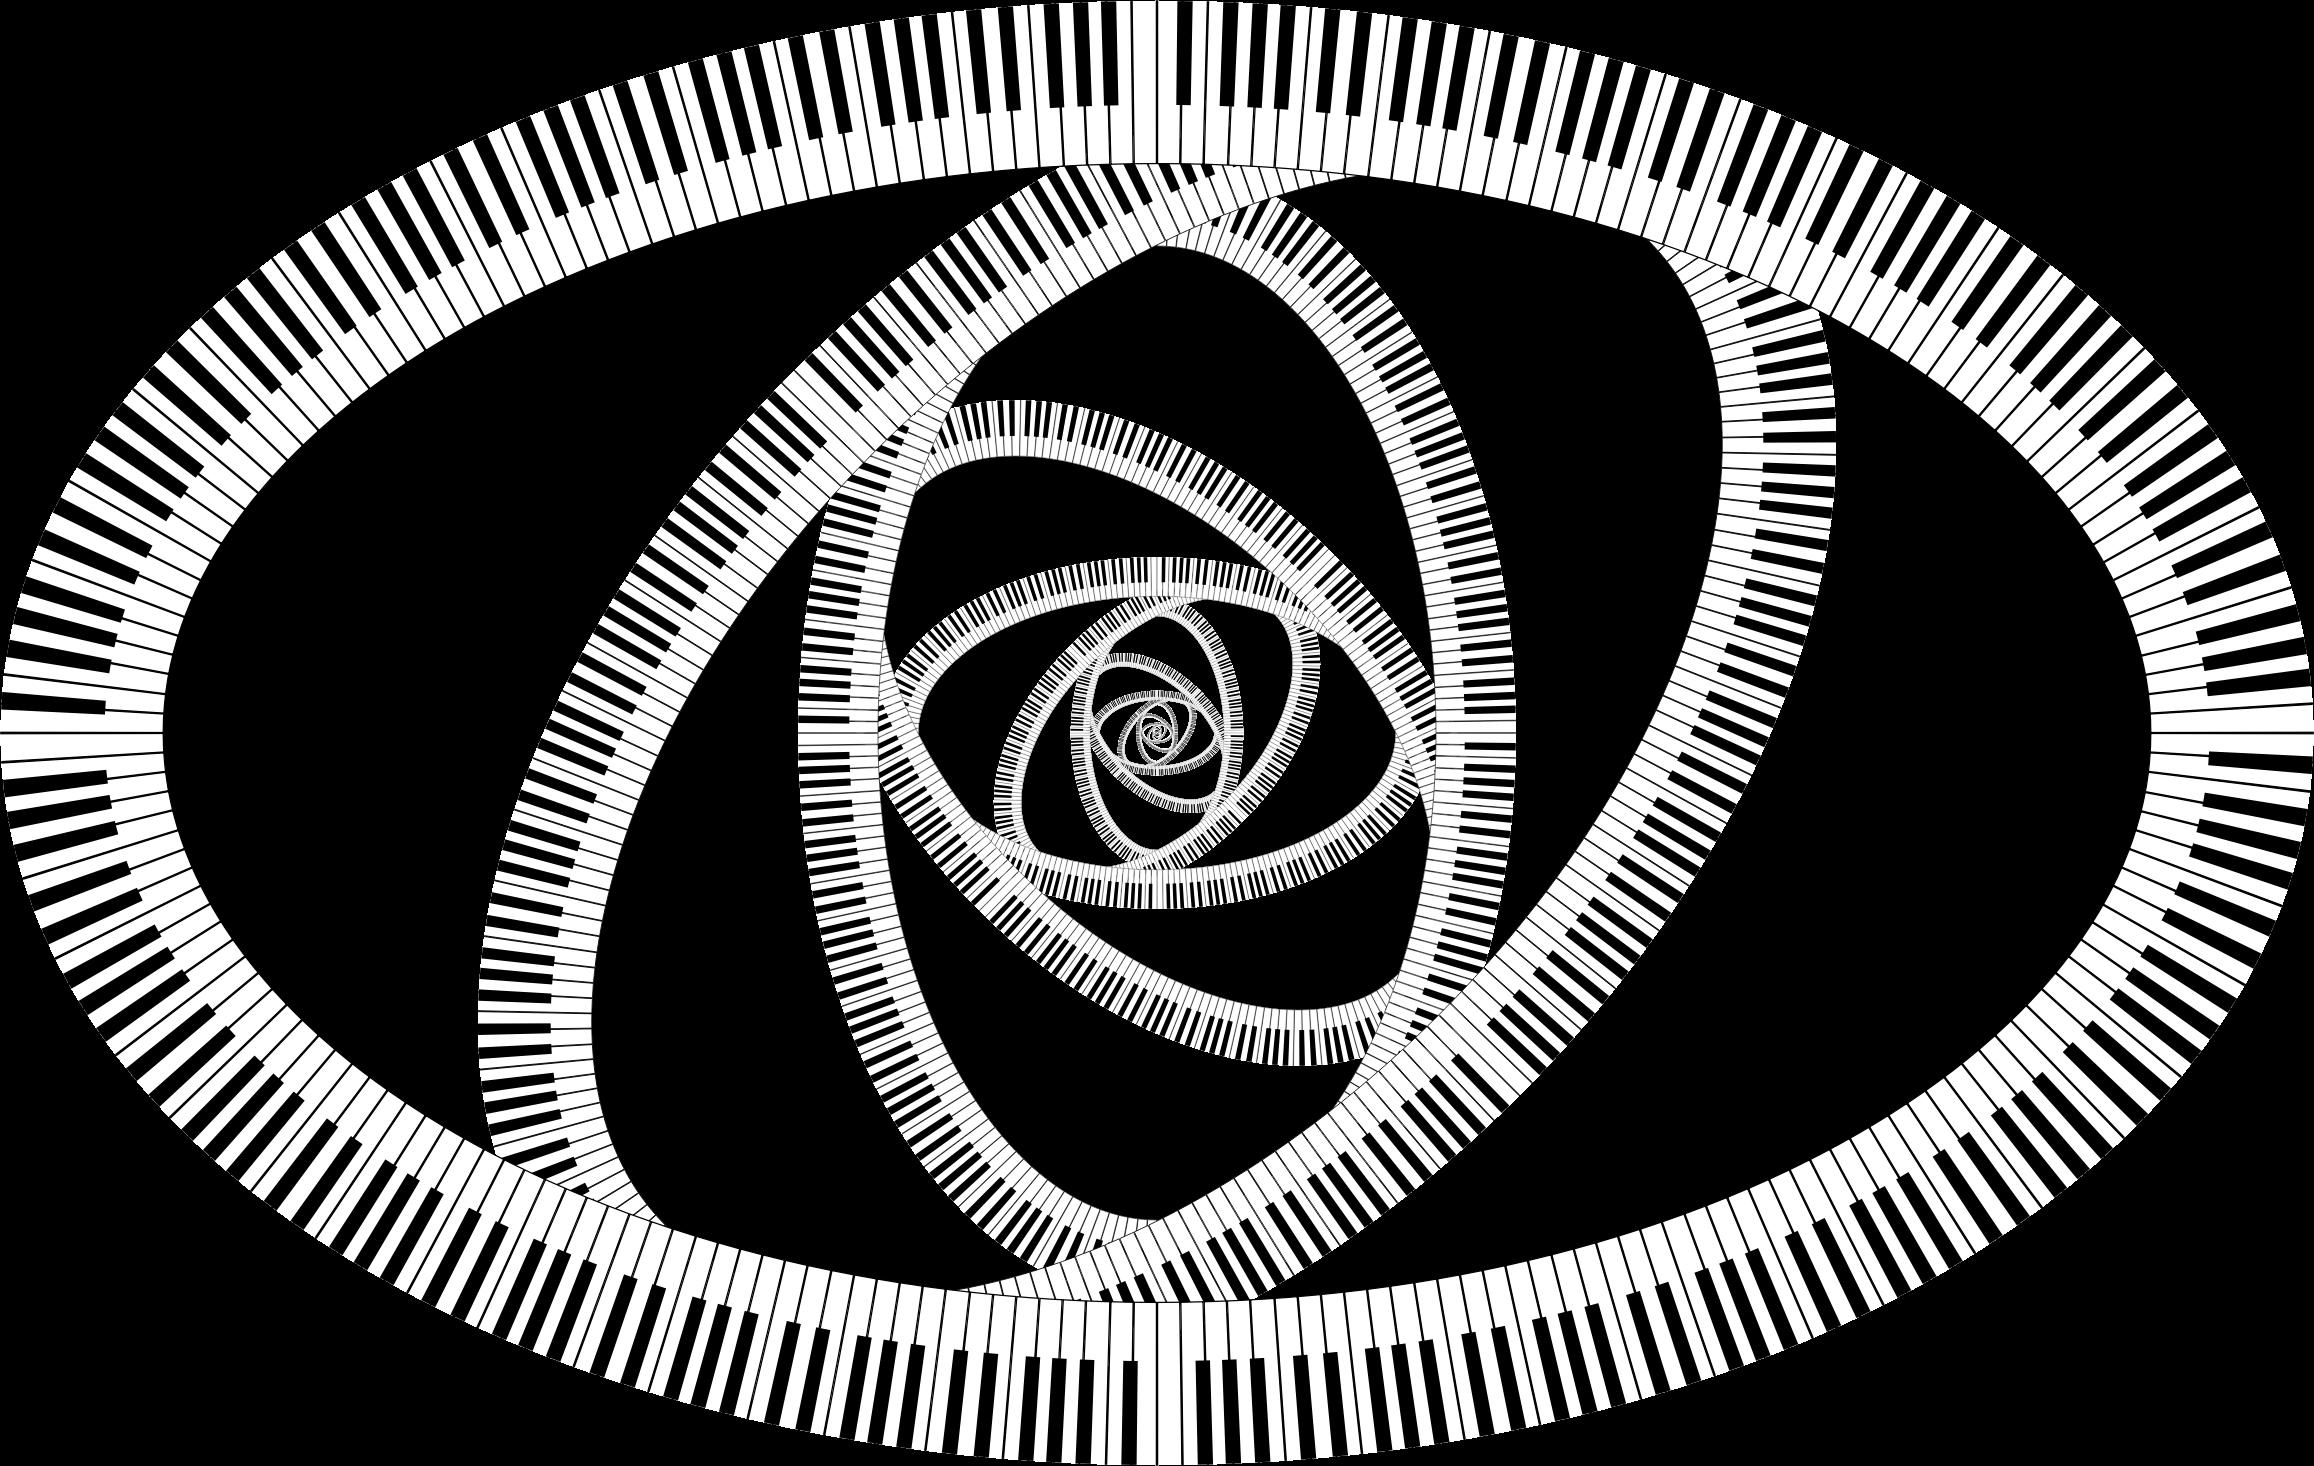 Keys drawing at getdrawings. Clipart piano swirl